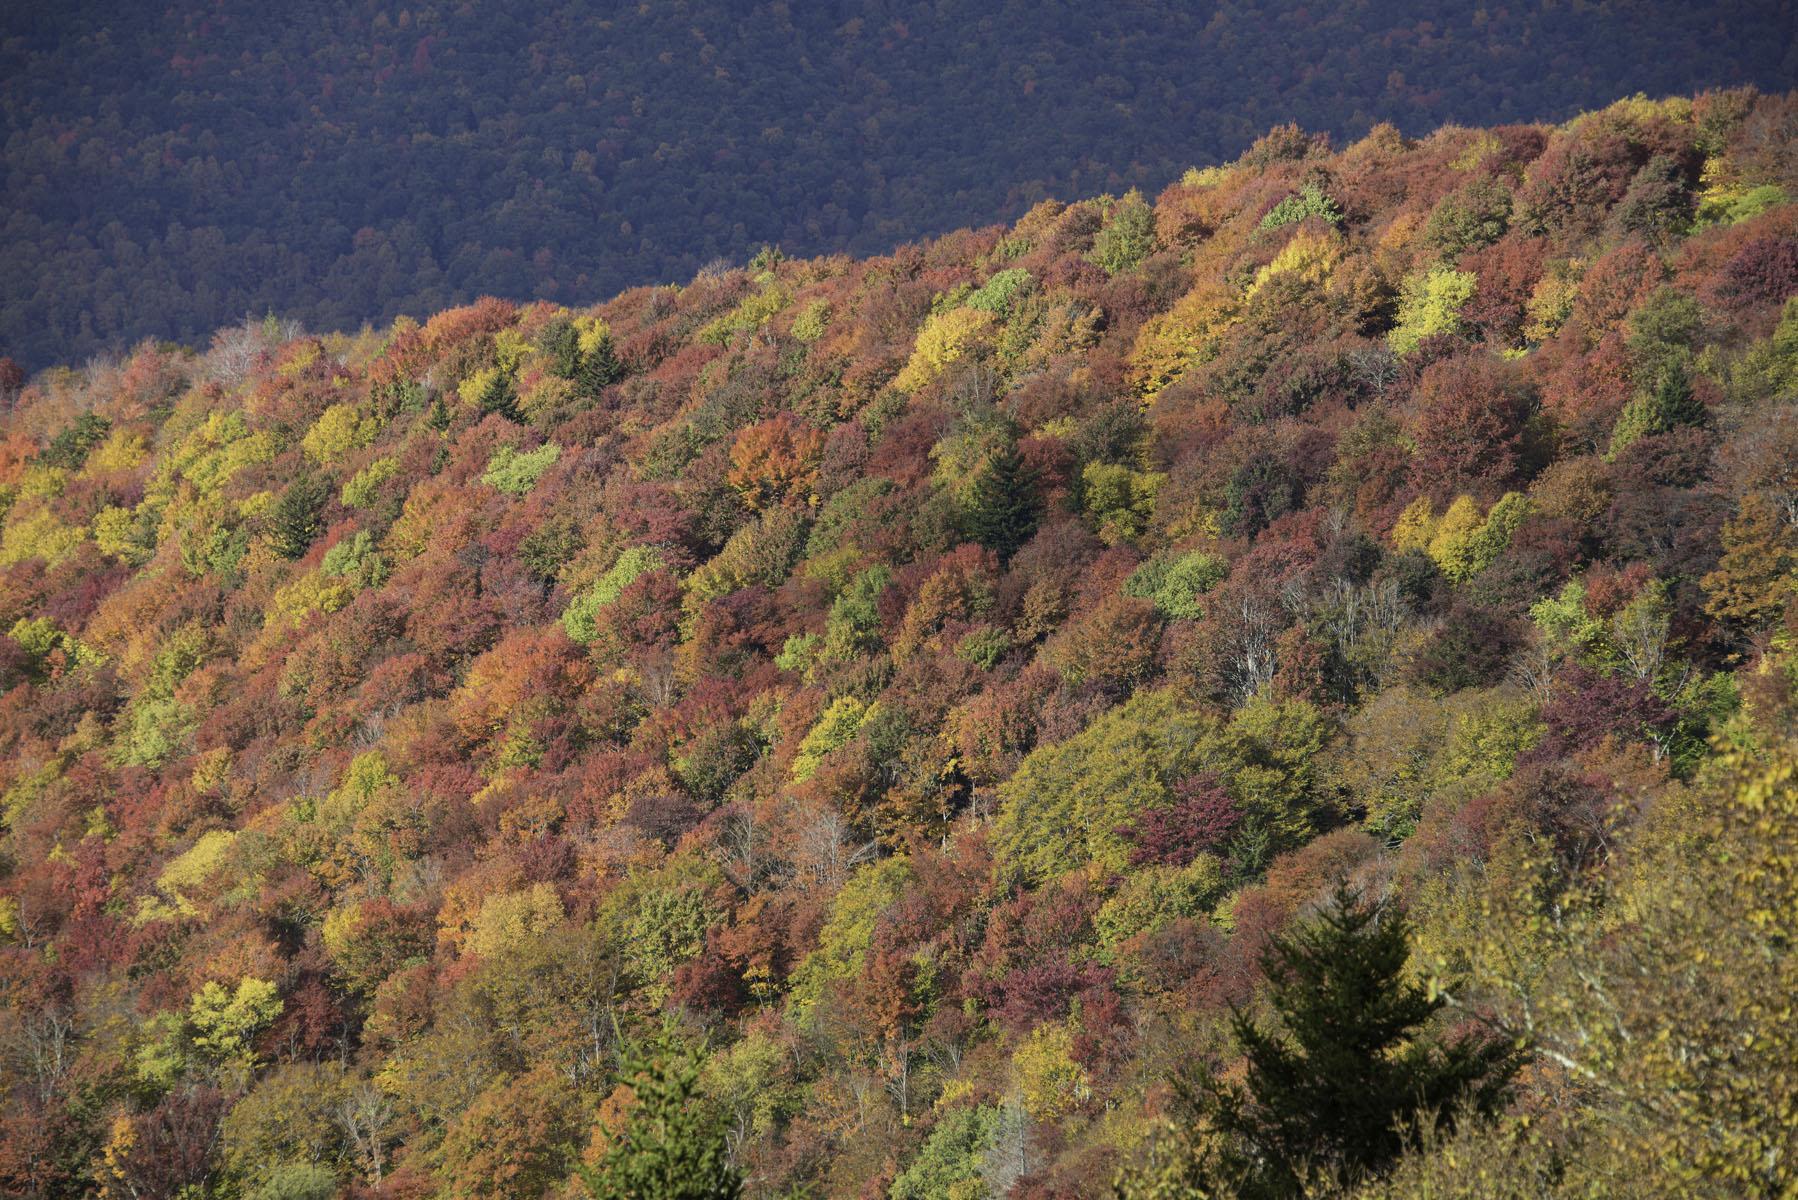 Close Up of Fall Foliage on Blue Ridge Parkway Near Asheville